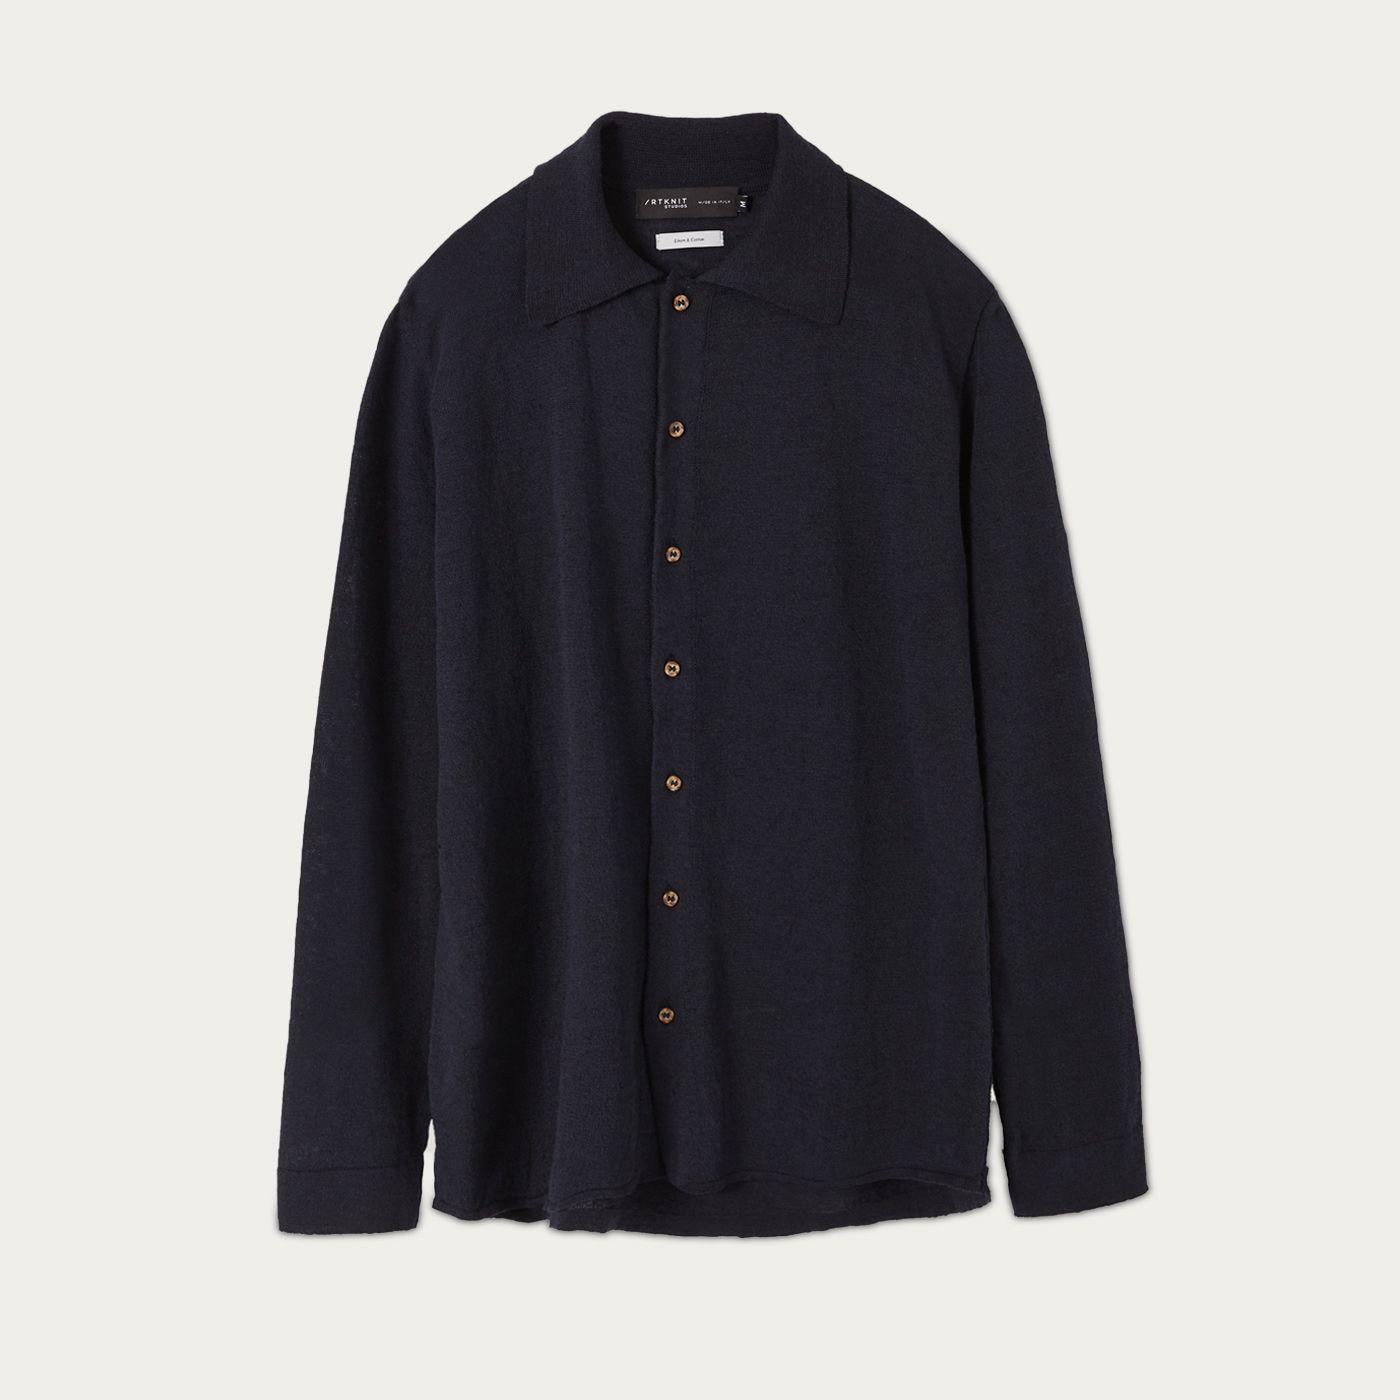 Blue Linen Knit Cardigan Shirt | Bombinate